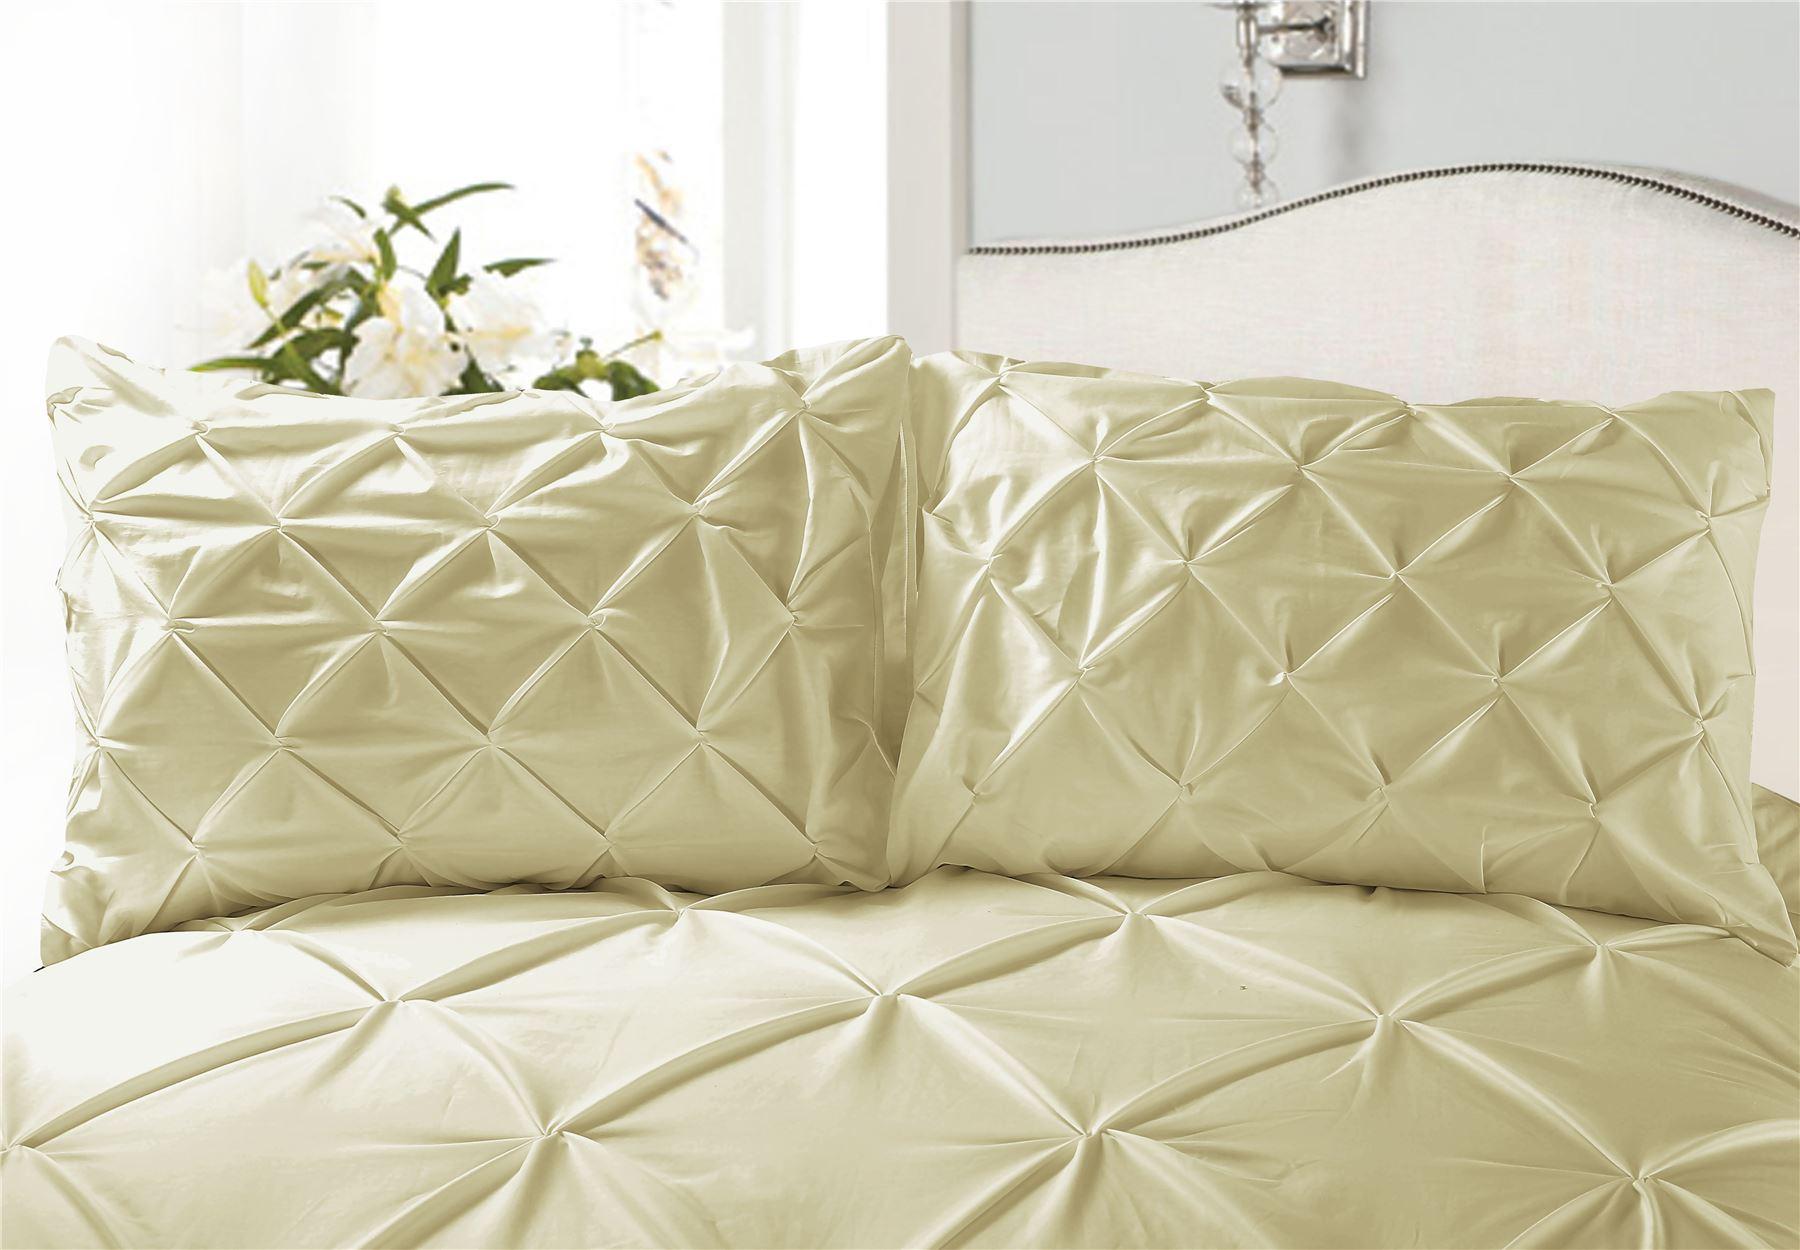 Luxury-Pure-100-Cotton-200-Thread-Pinch-Pleat-Pintuck-Puckering-Duvet-Cover-Set thumbnail 49